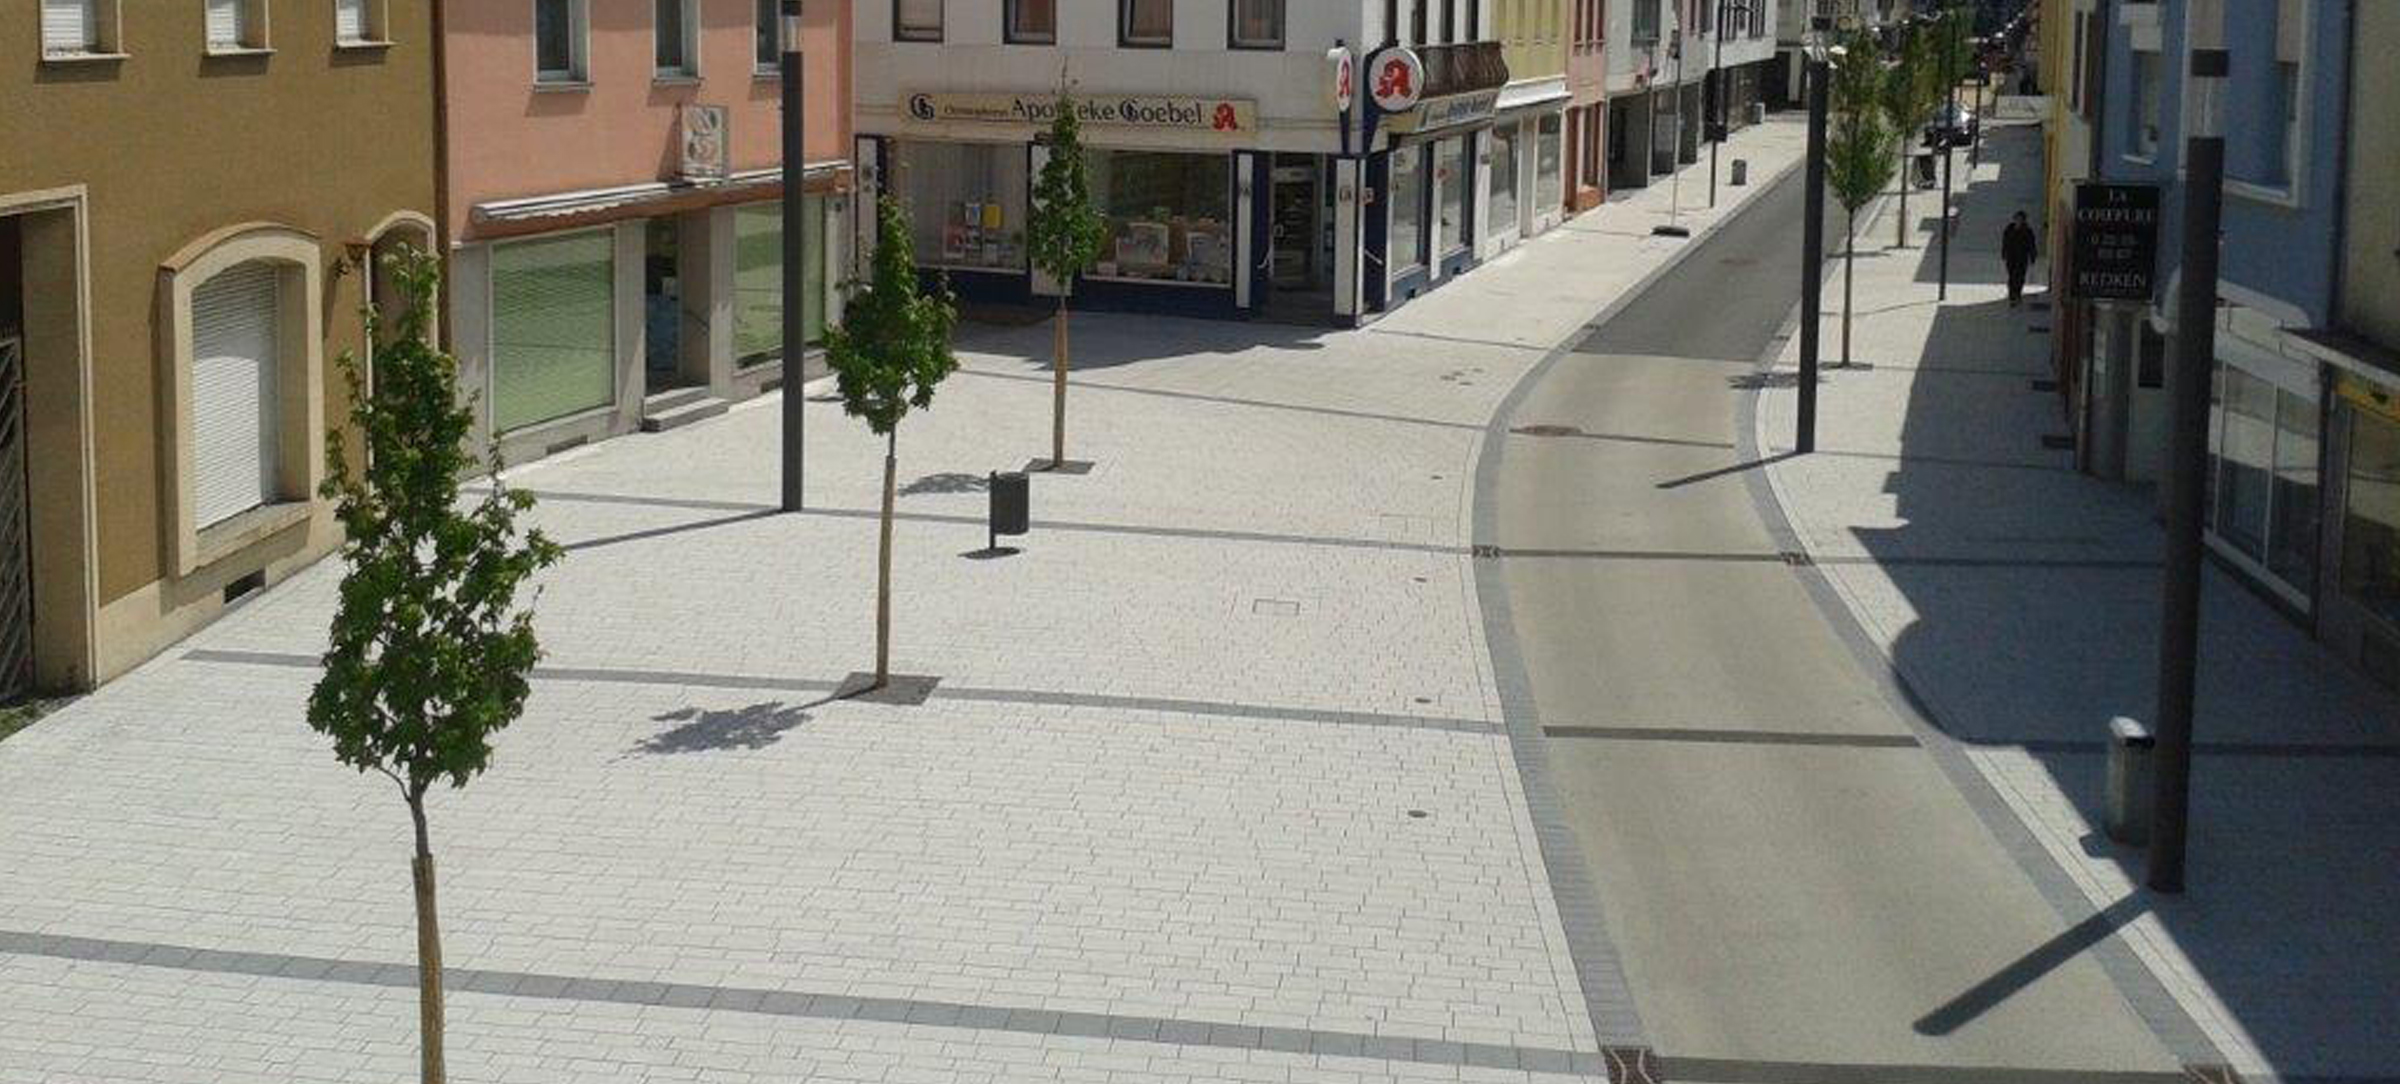 Permalink auf:Meckenheim Altstadt | Hauptstraße